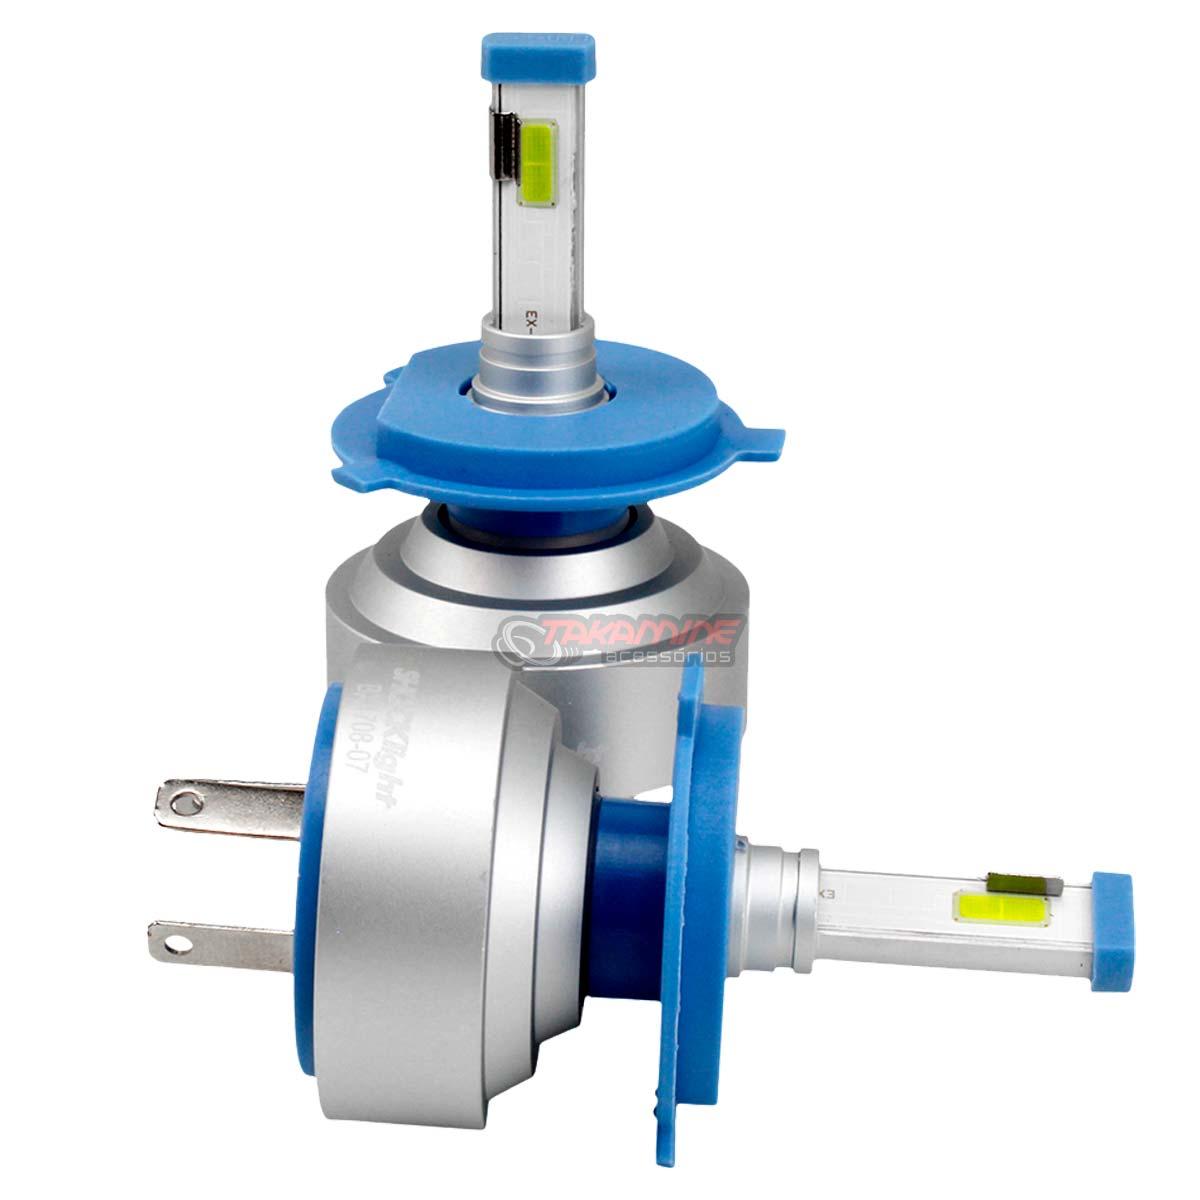 Kit LED Ford Ka 2012 até 2020 tipo xenon modelo H4 35W encaixe original plug & play New Headlight